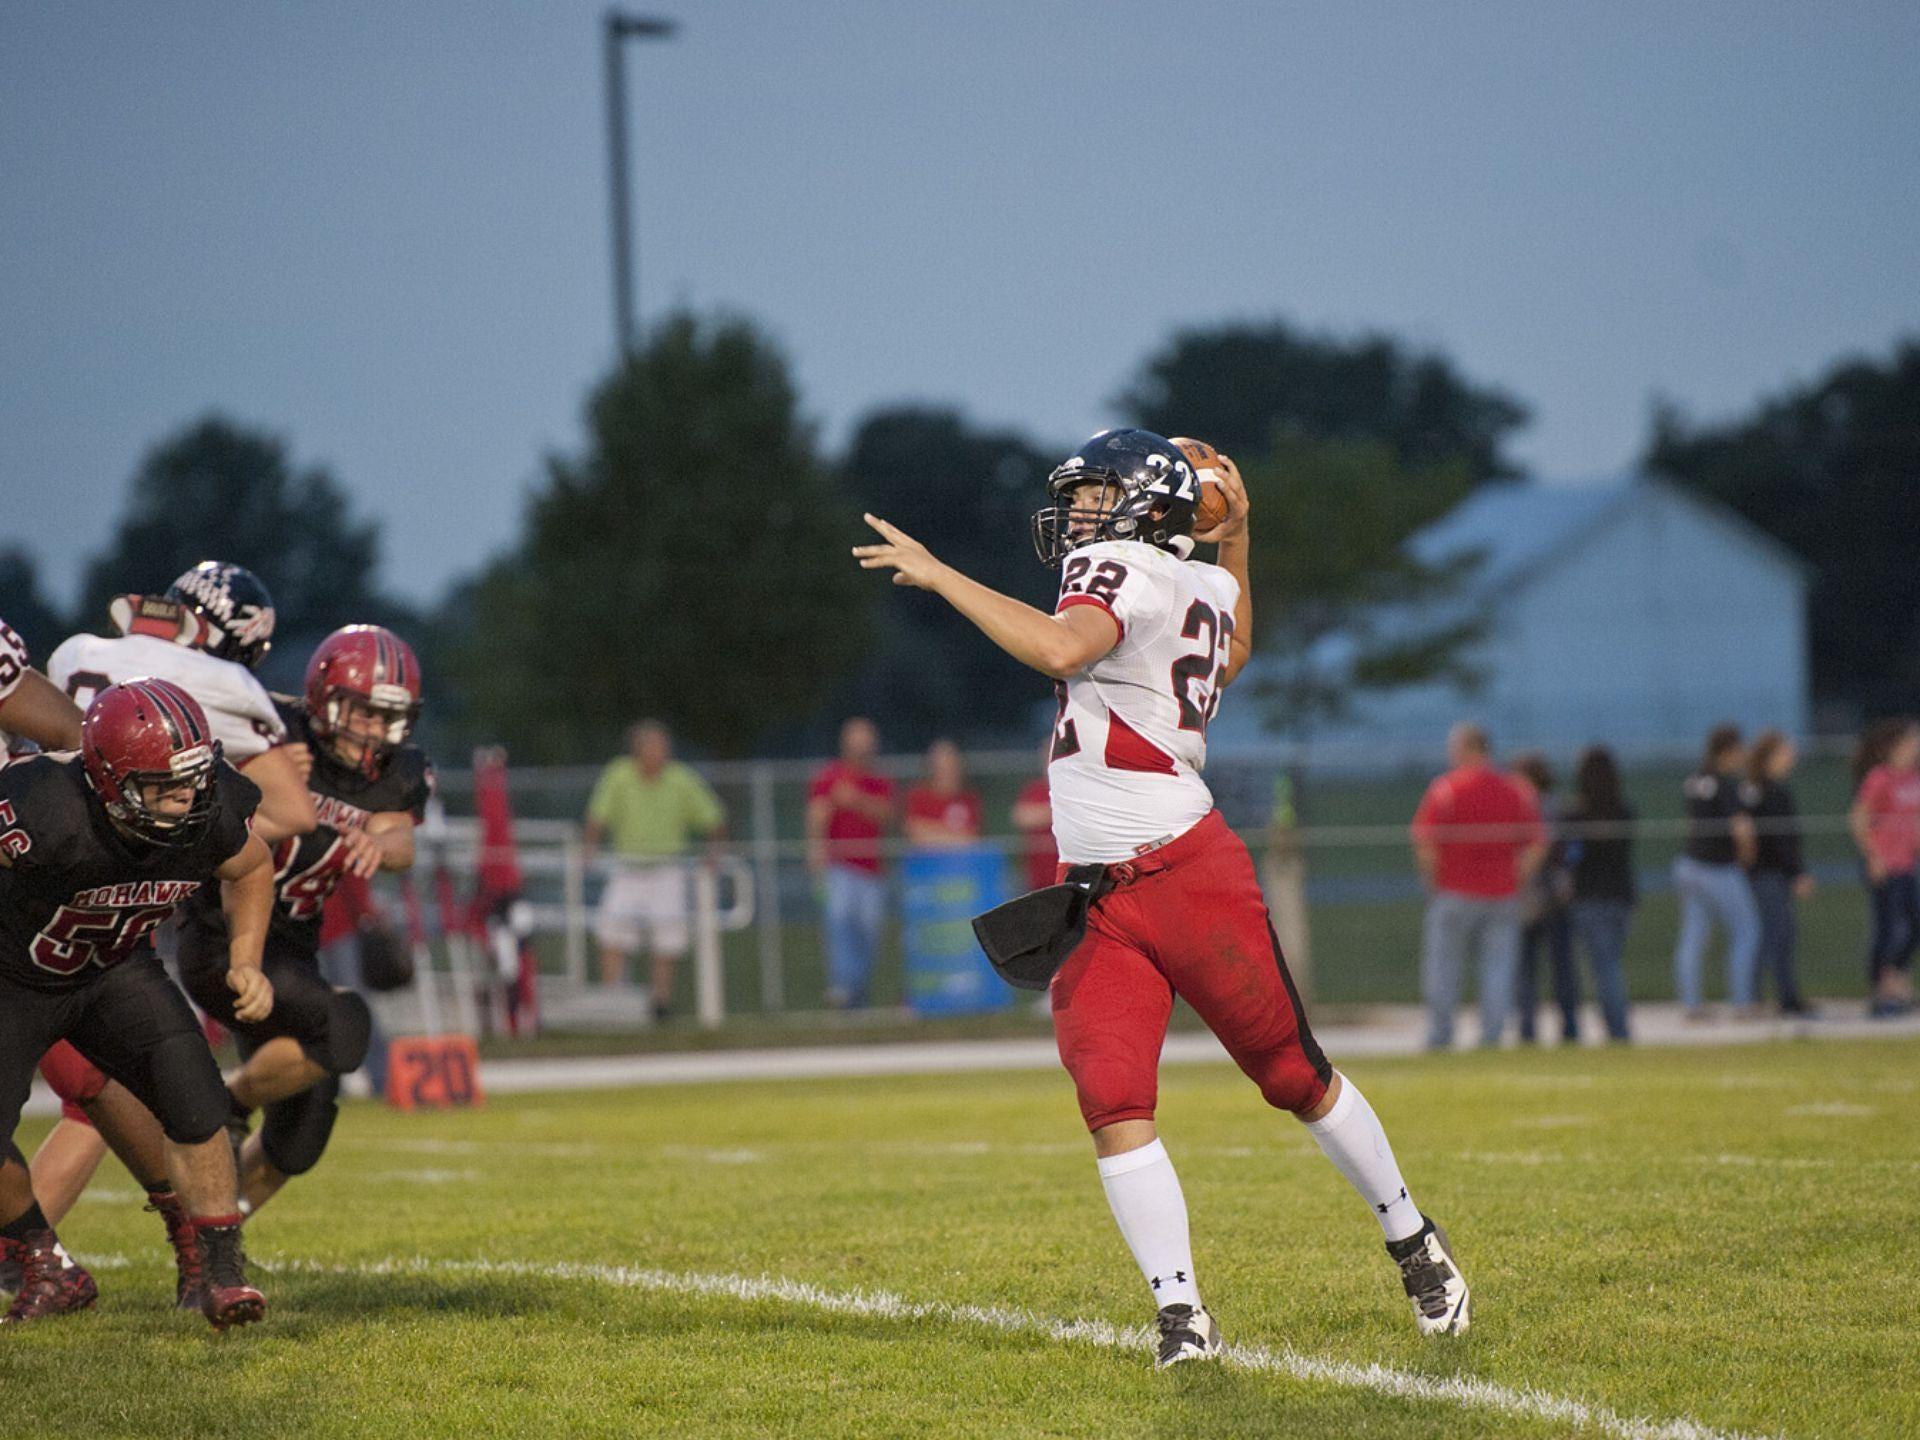 Bucyrus quarterback Gavin Lewis attempts a pass against Mohawk last week.